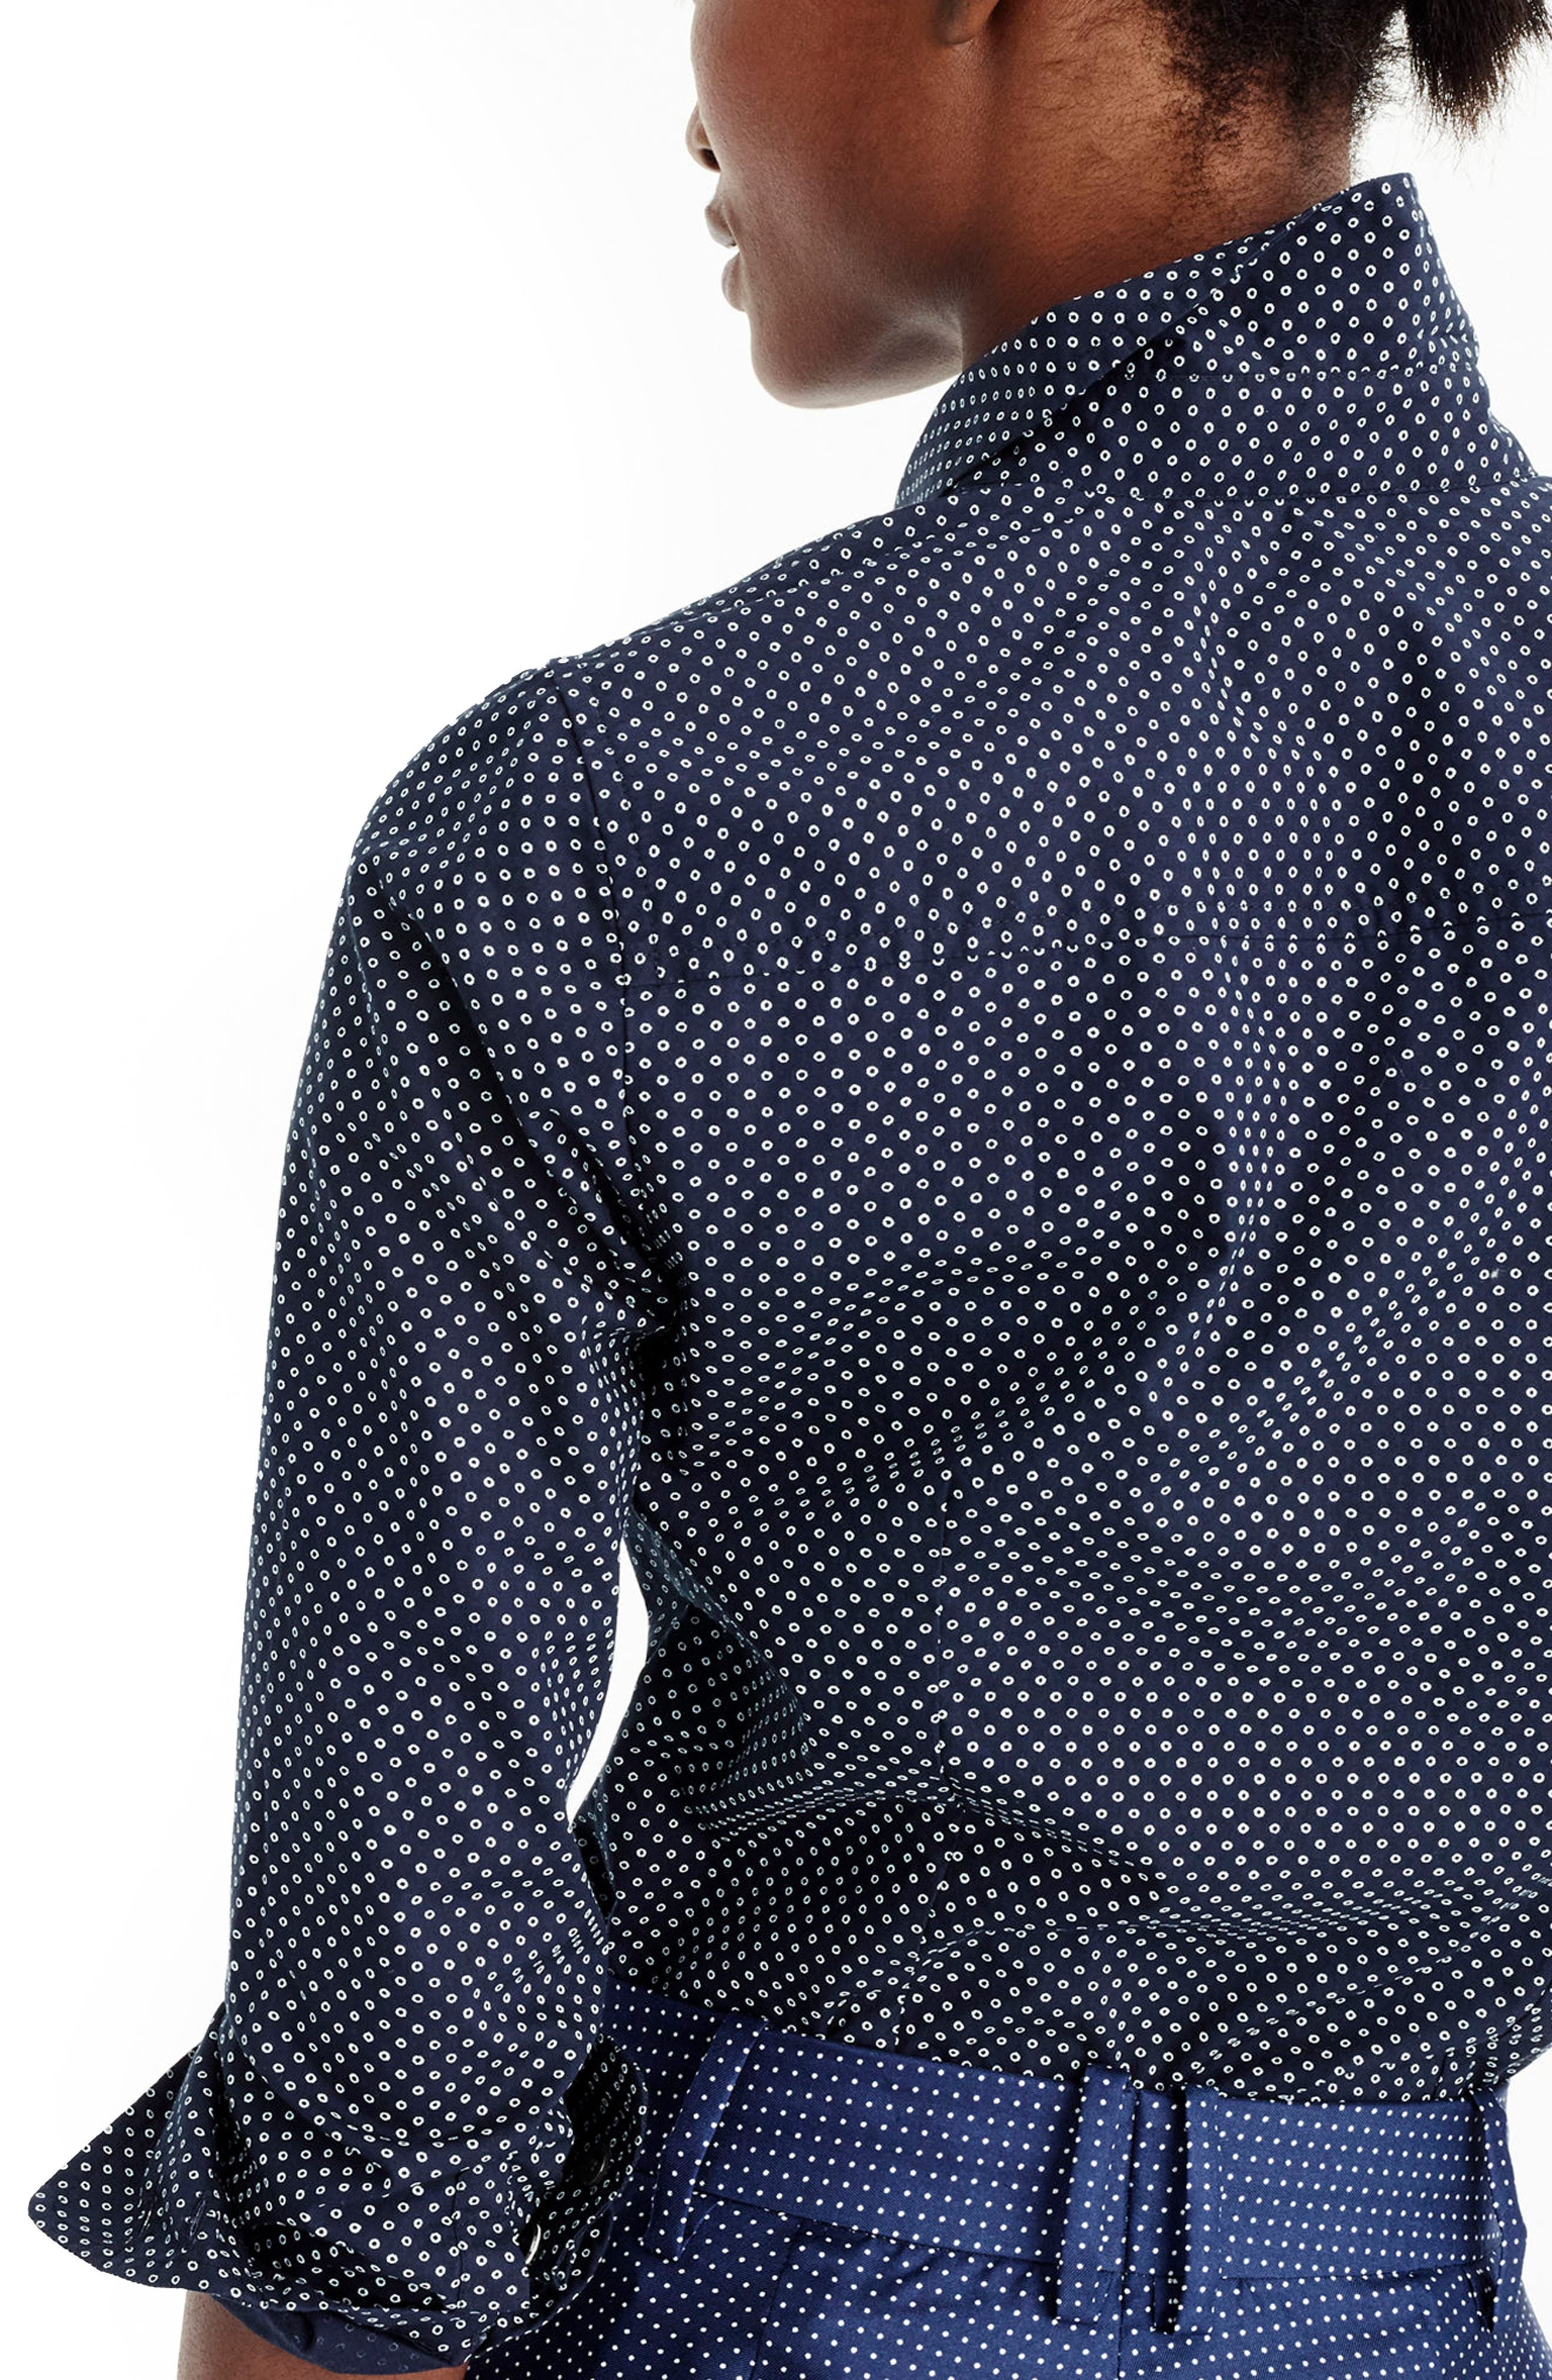 Alternate Image 2  - J.Crew Polka Dot Button-Up Shirt (Regular & Petite)